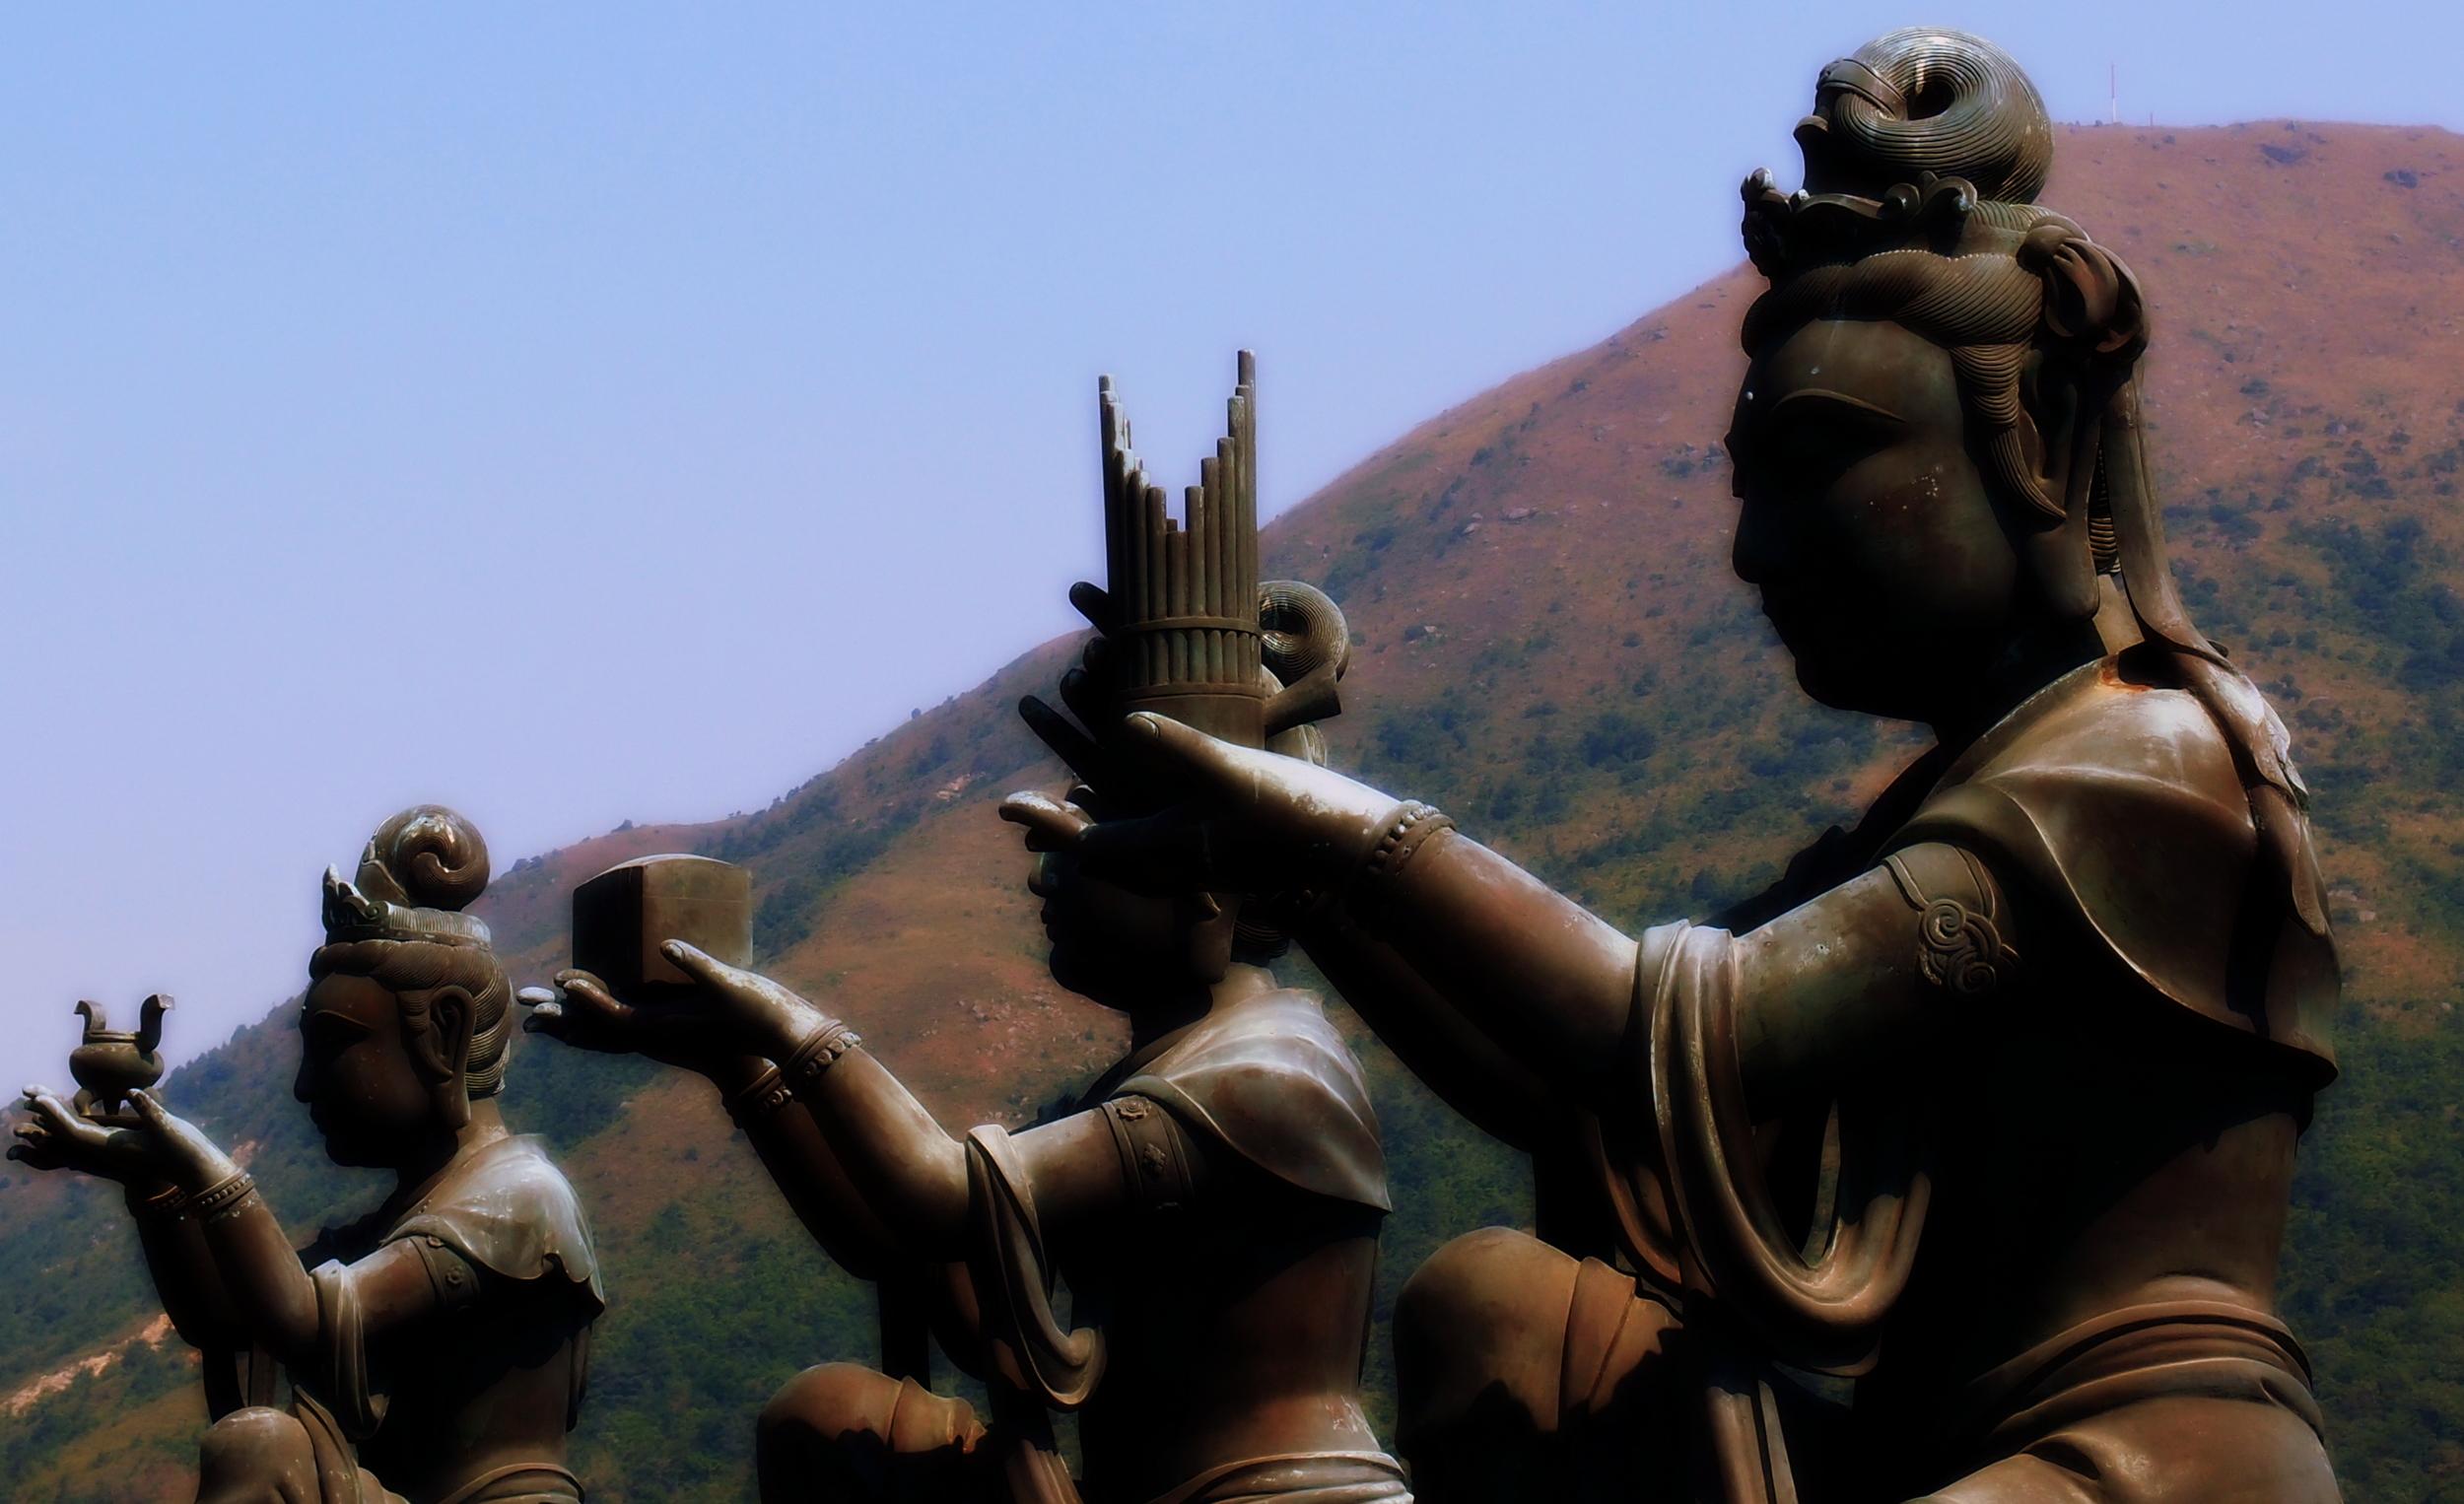 The Giant Buddha - Lantau